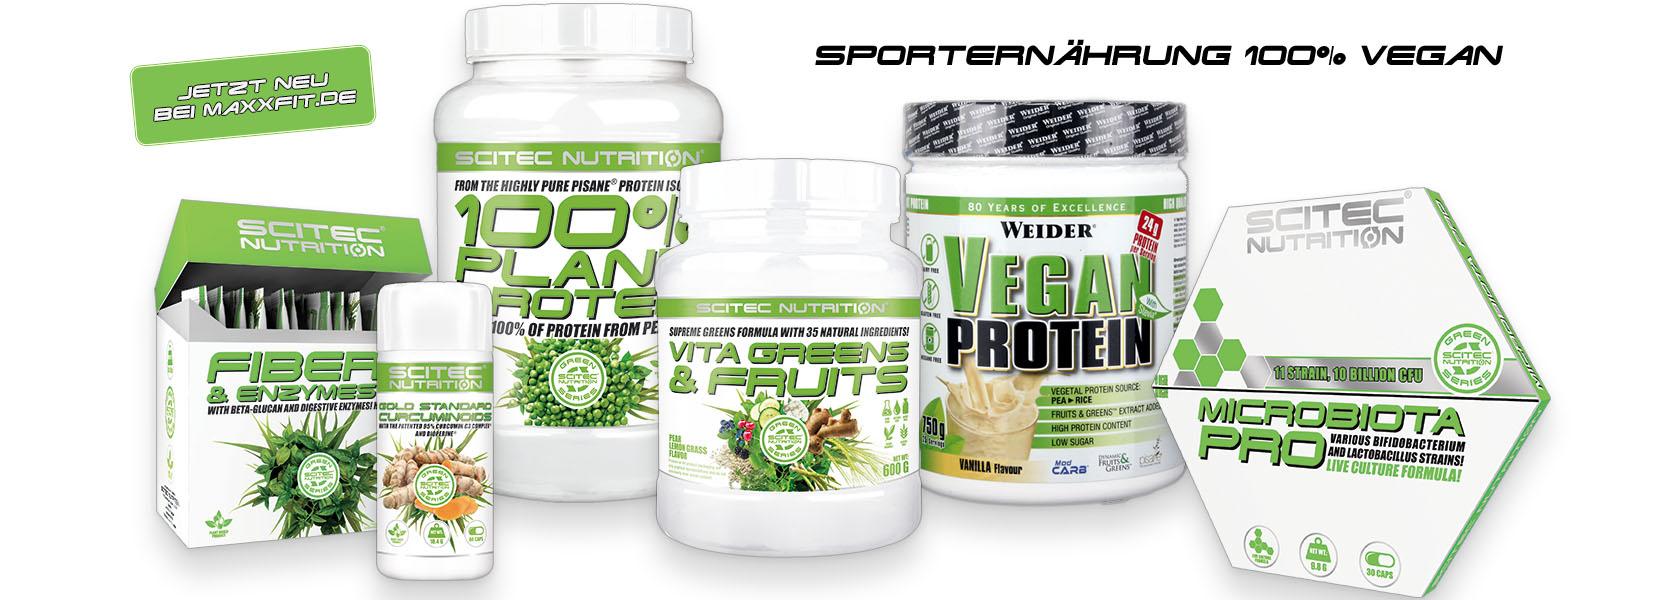 Vegane Sporternährung bei Maxxfit.de